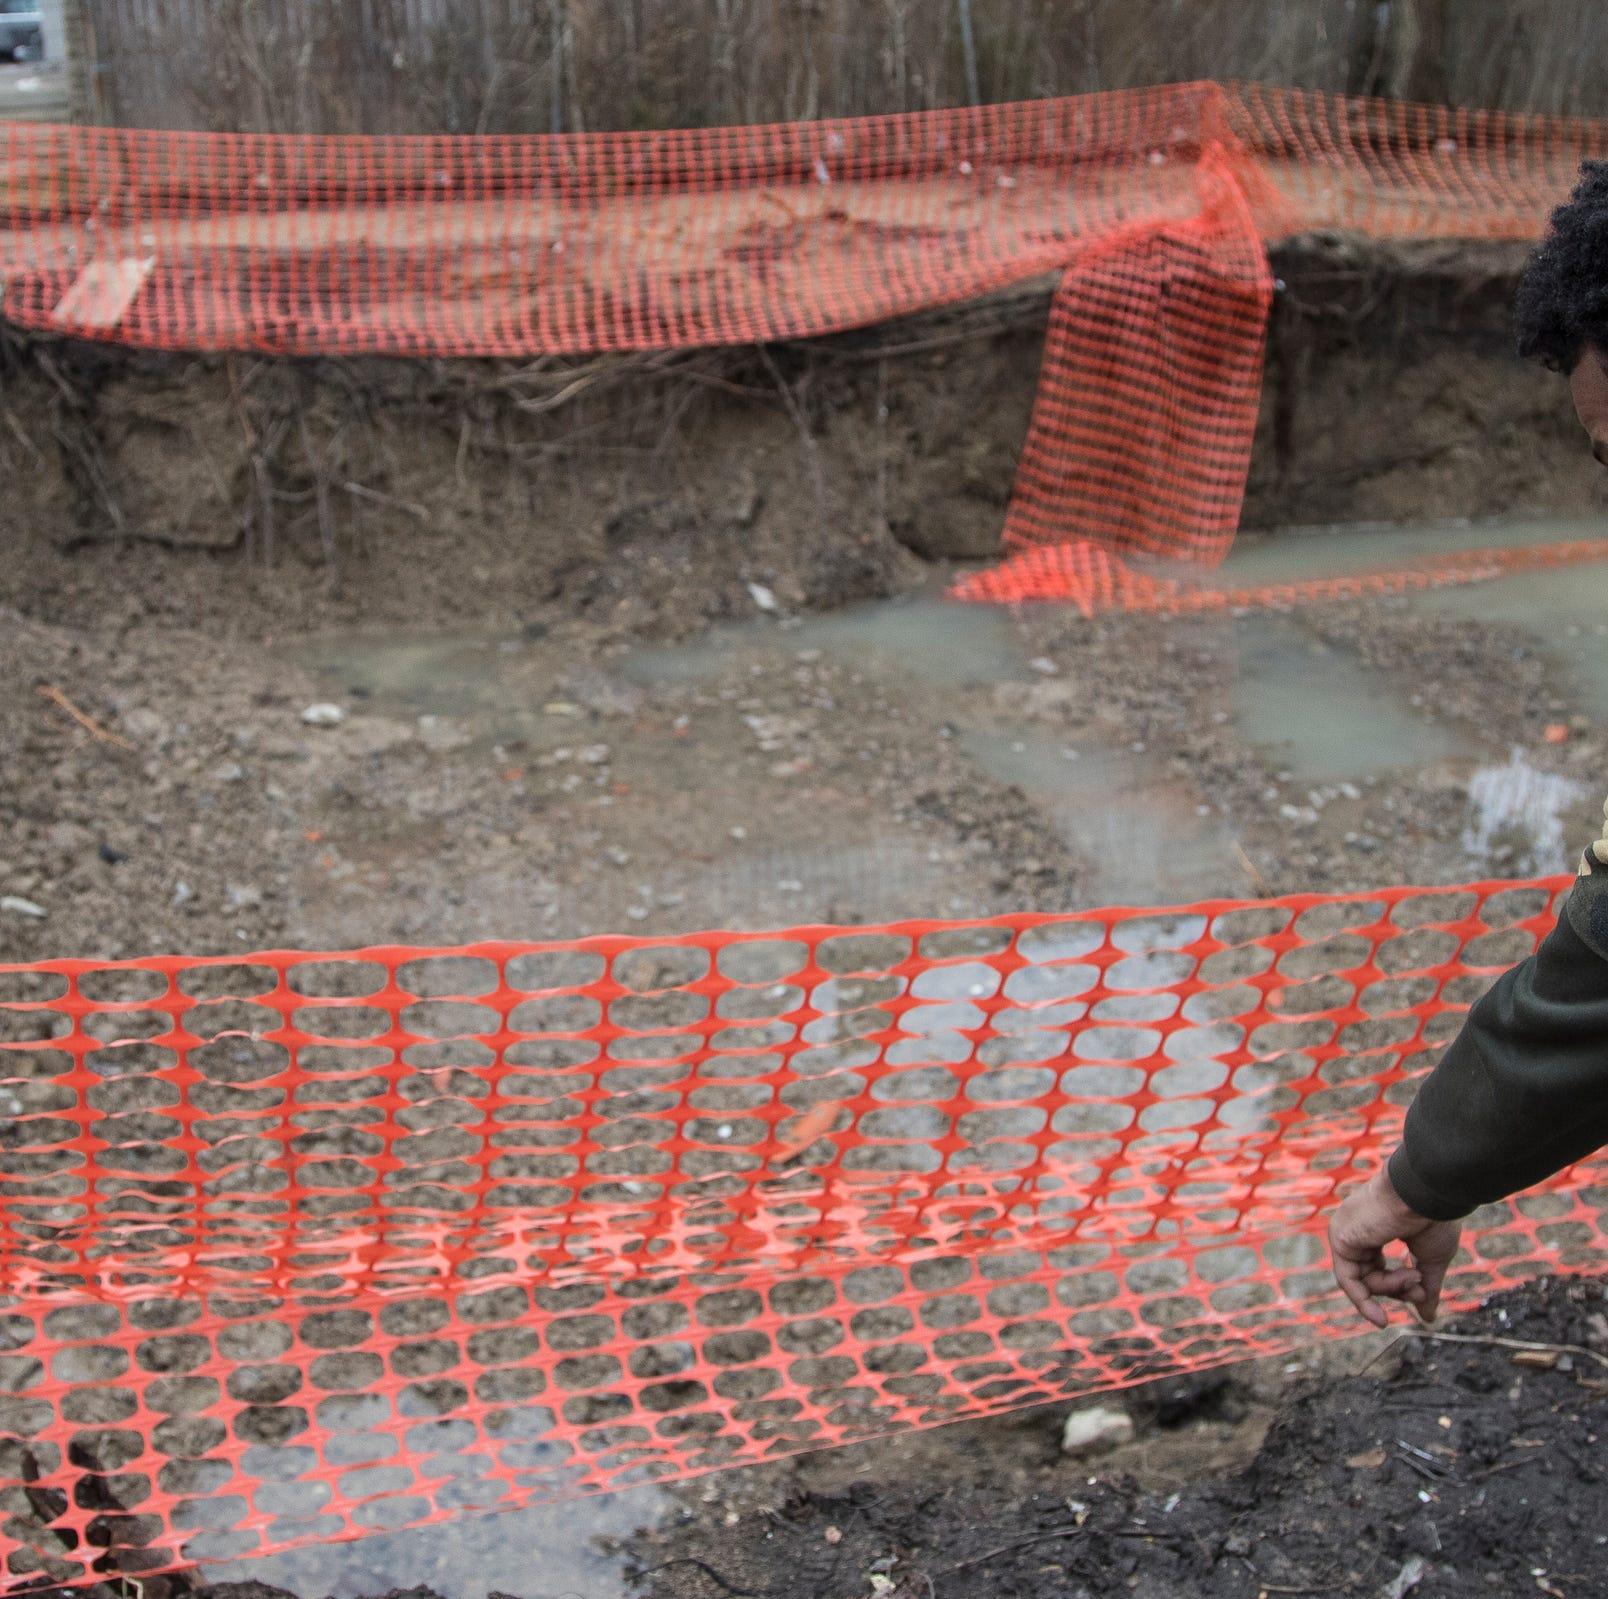 Michigan lawmaker: Alleged tainted dirt at demolition sites 'alarming'